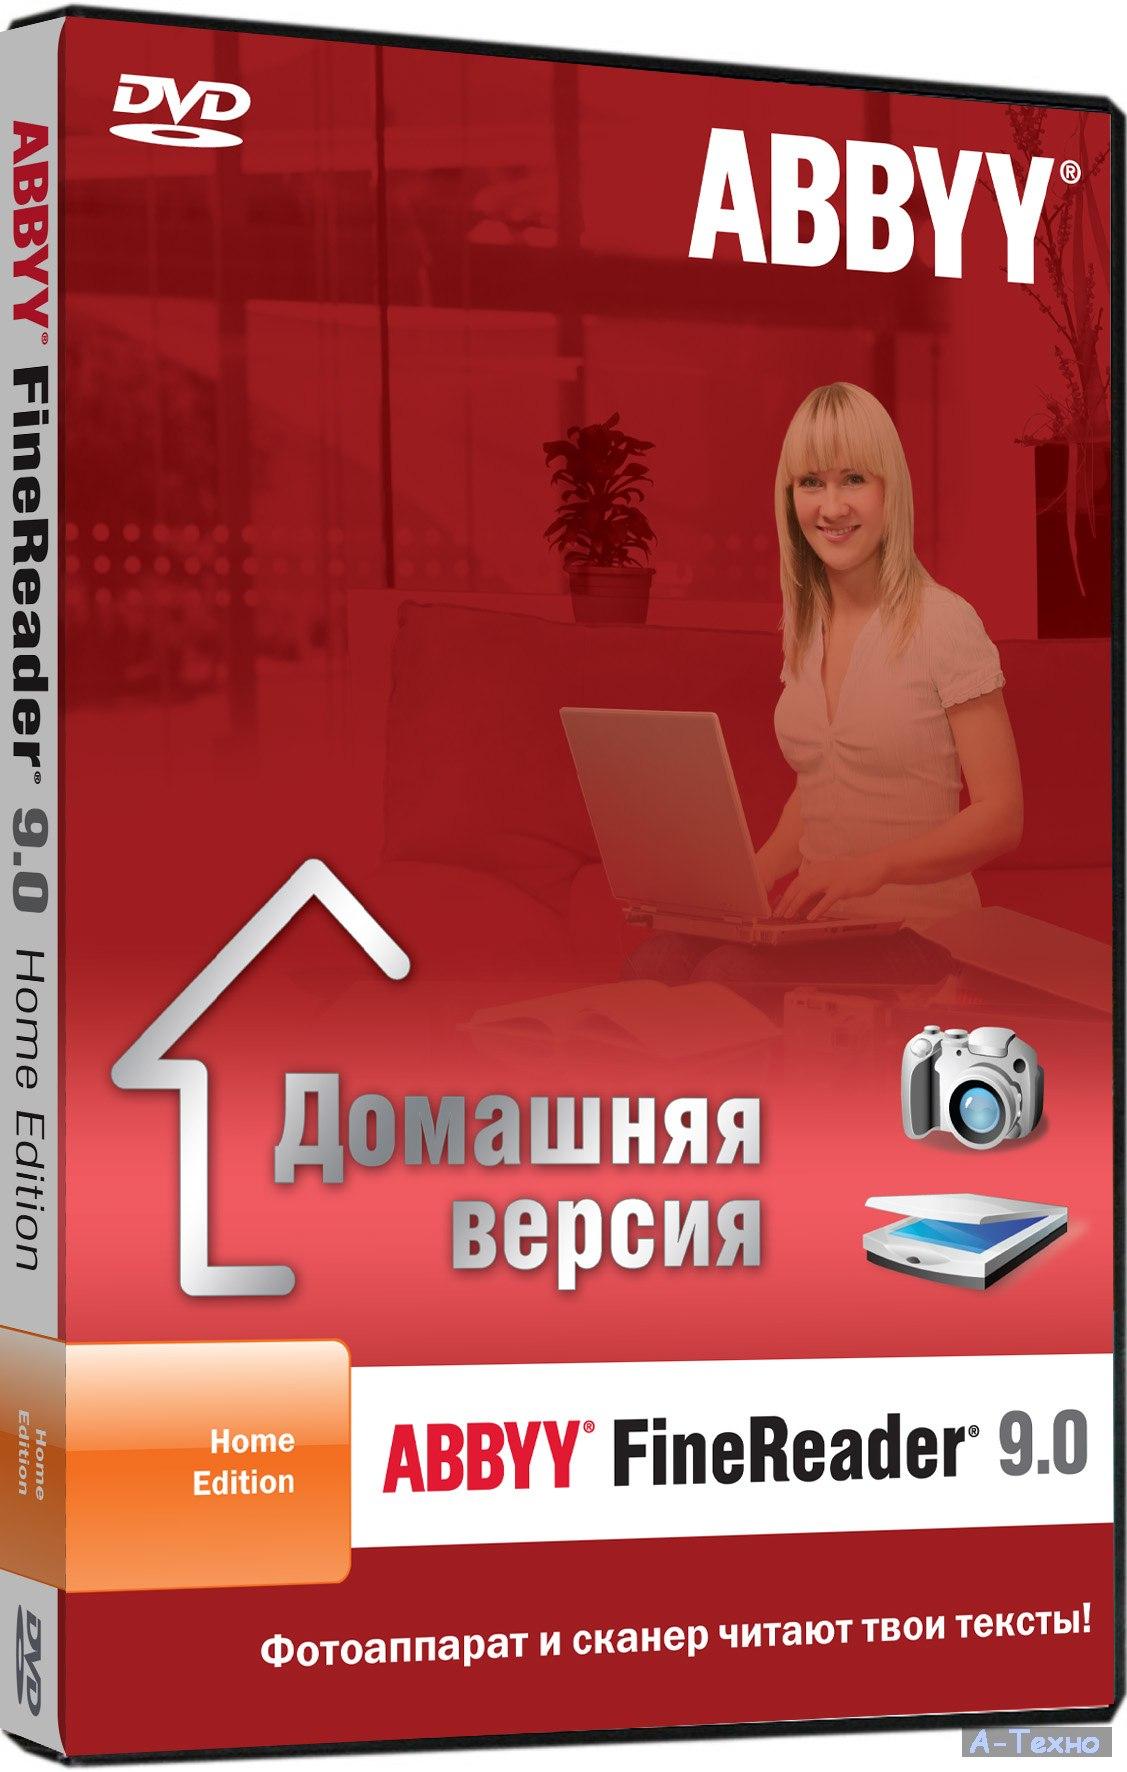 Abbyy finereader sprint by abbyy software house